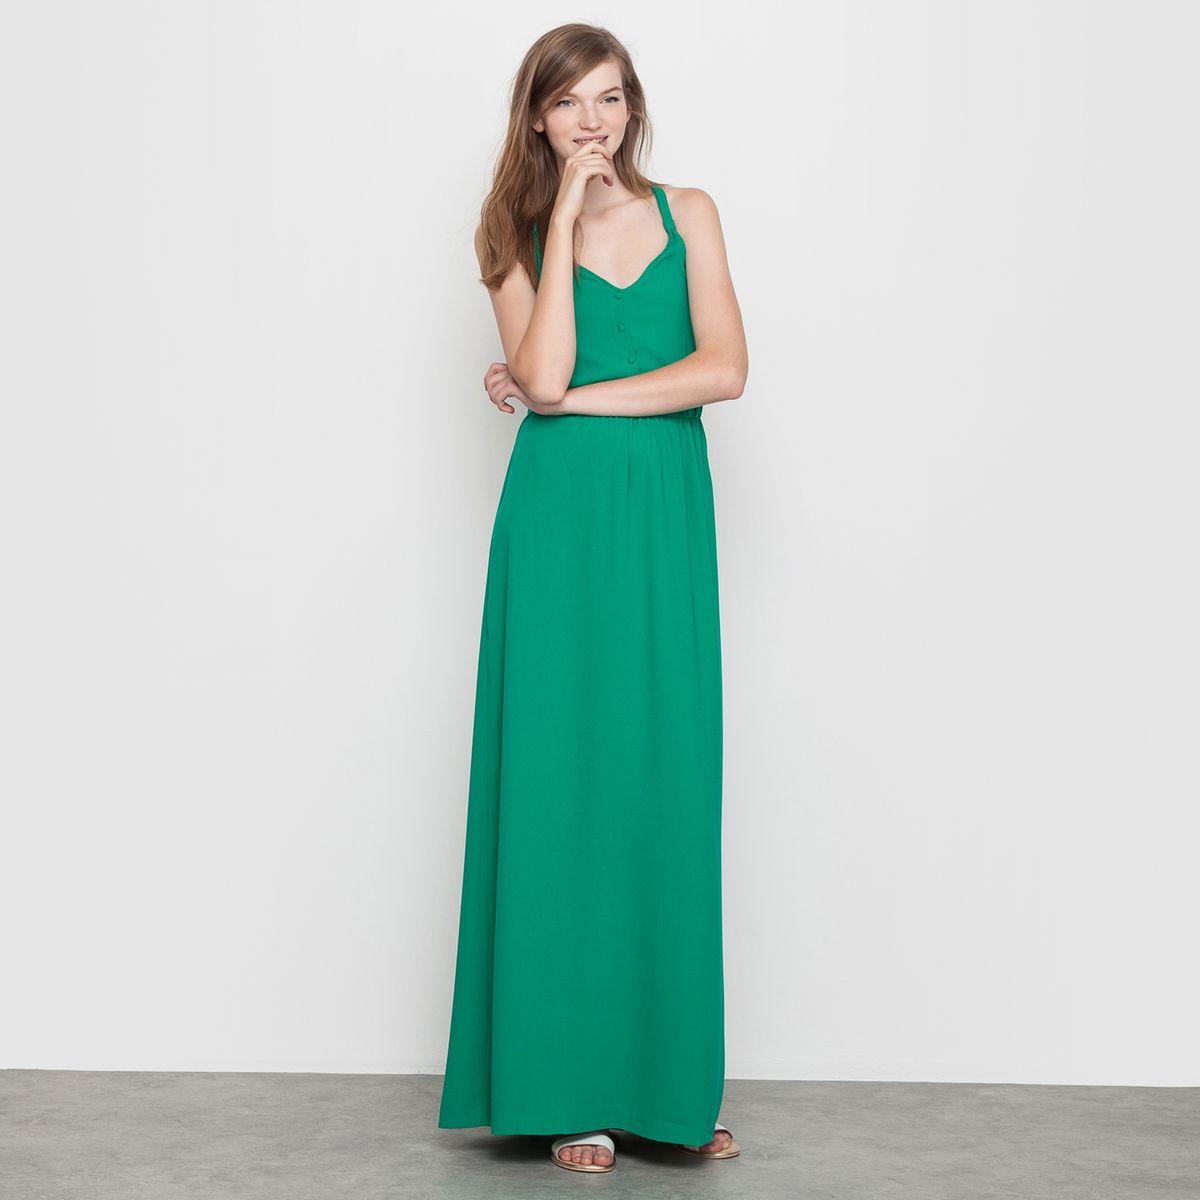 Adoptez la classe de la robe longue